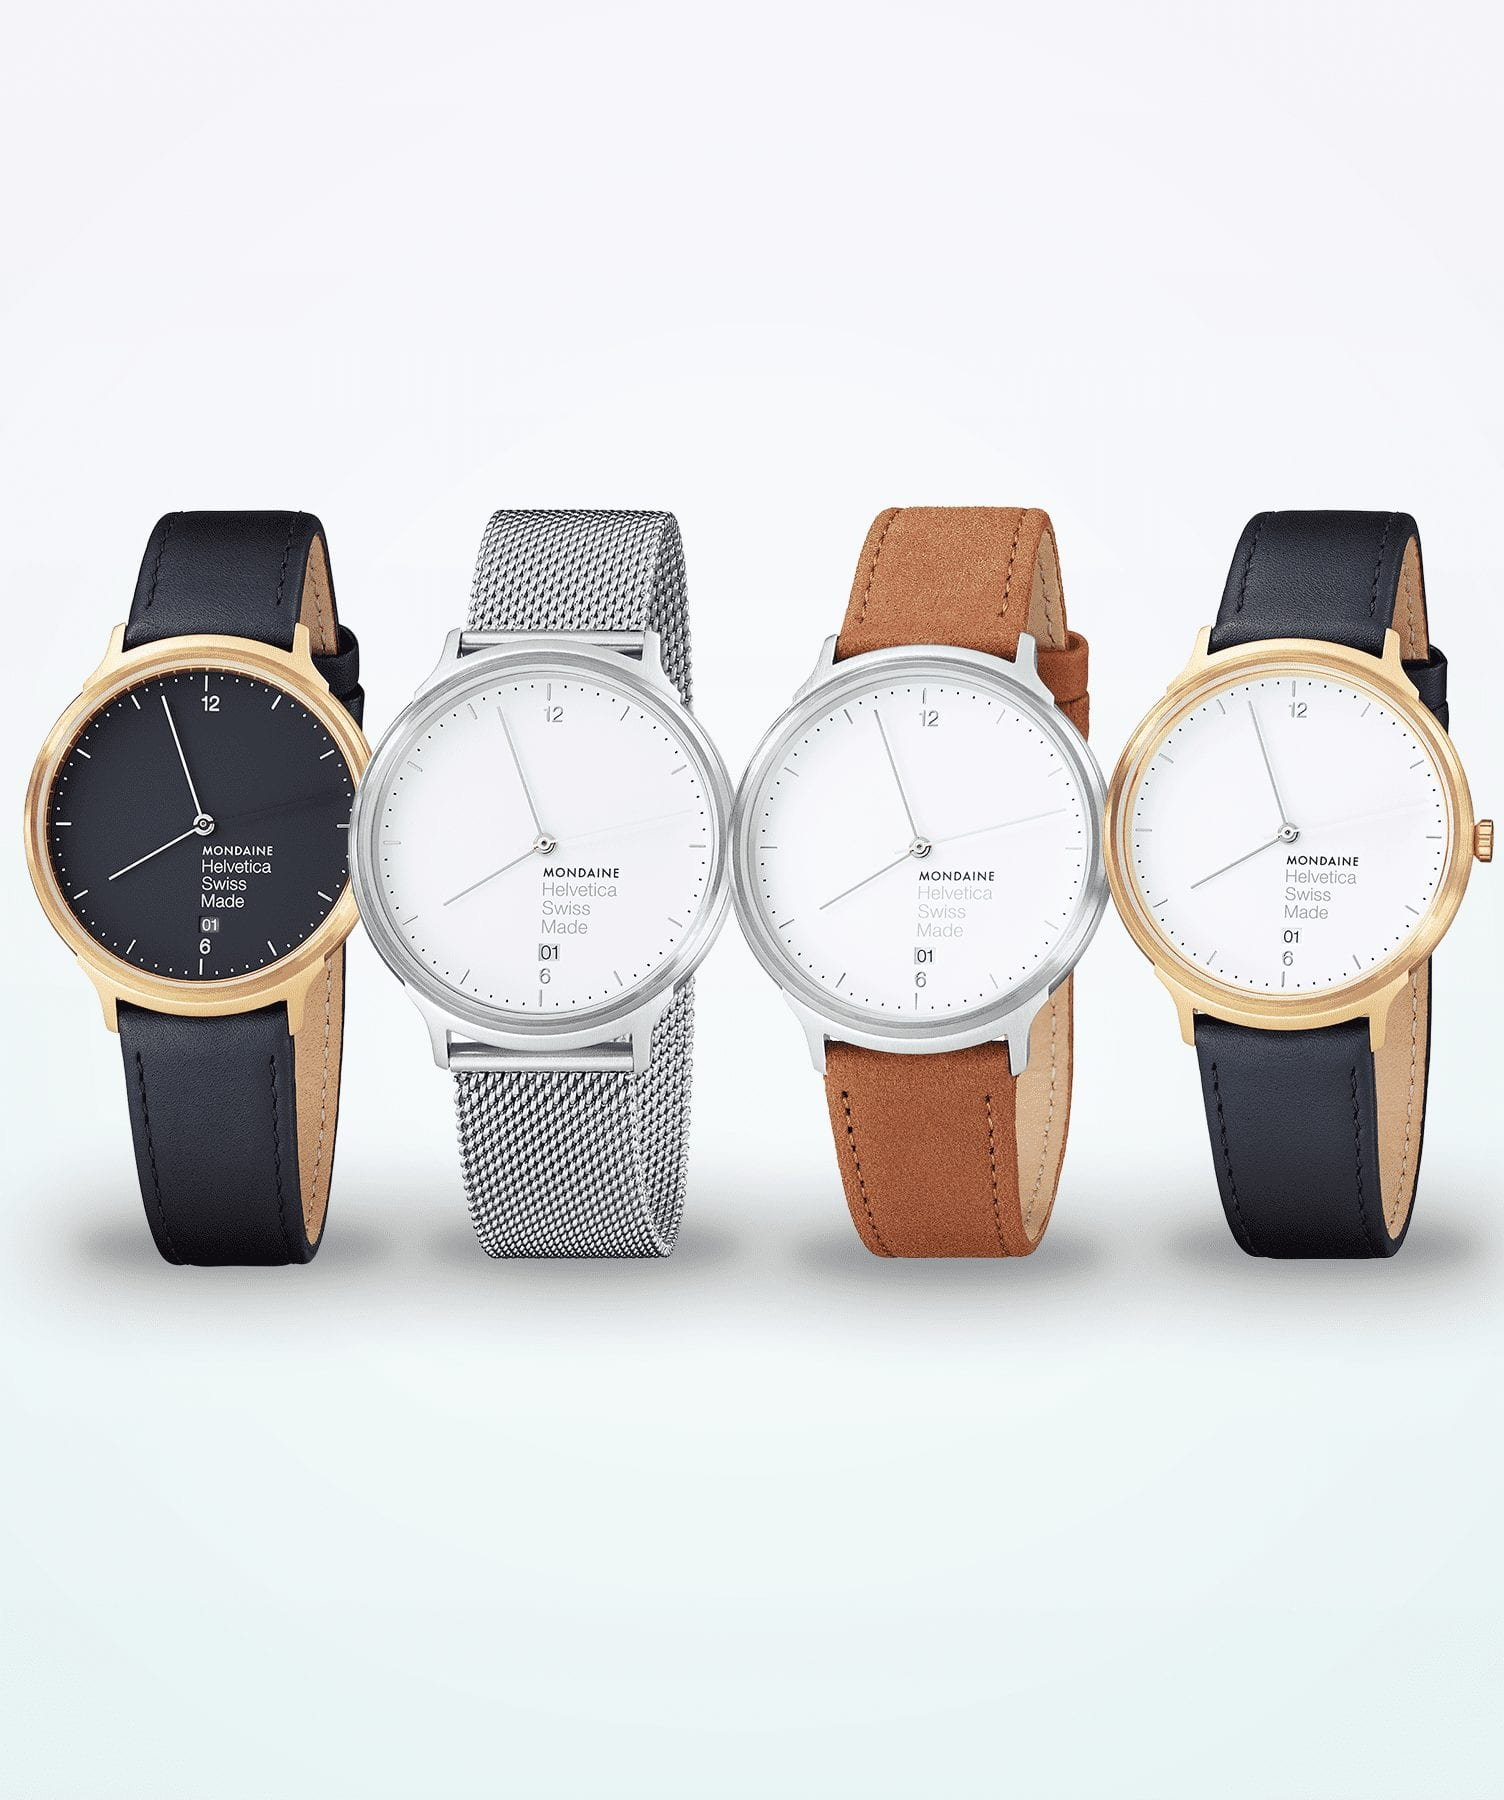 mondaine-helvetica-no1-regular-unisex-reloj de pulsera